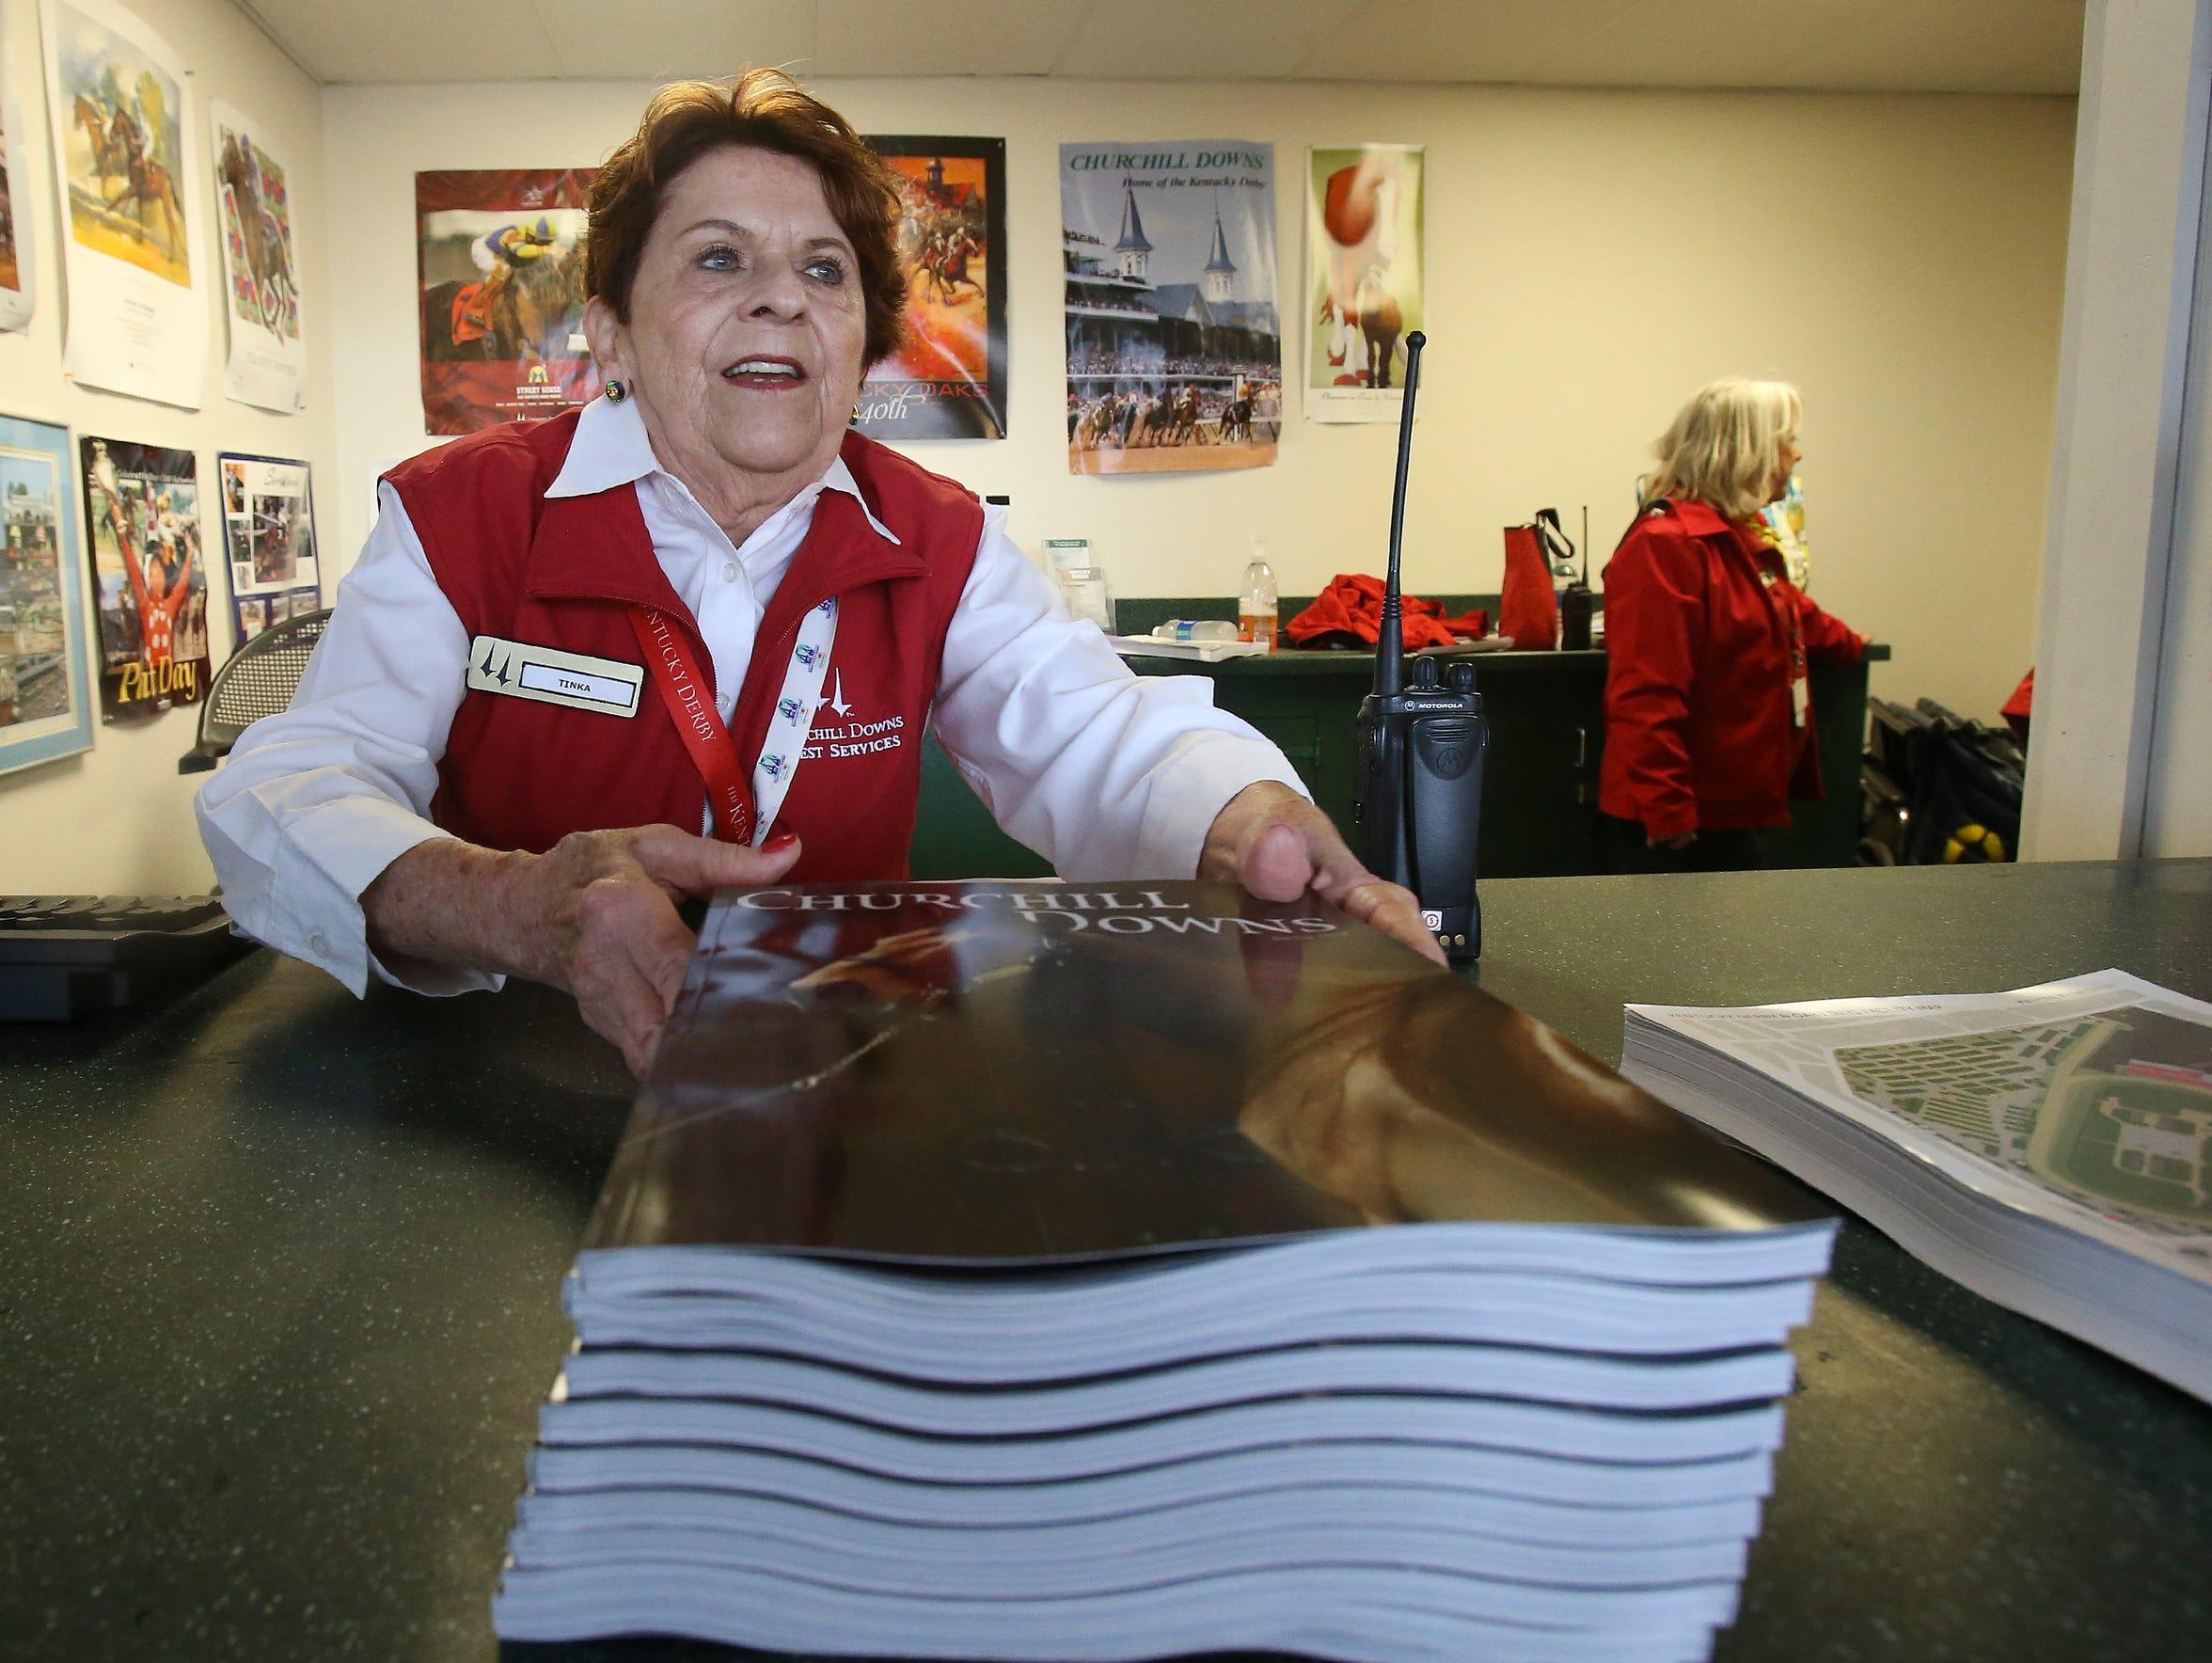 Guest services team member Tinka Tingle displays literature